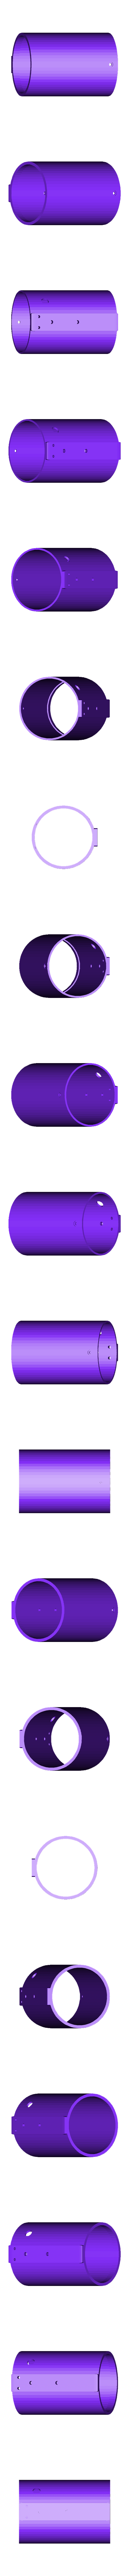 BSL_Tube_head.stl Download free STL file Bedside Lamp (Tube), LED 12V 2.5W • 3D printer model, Seabird